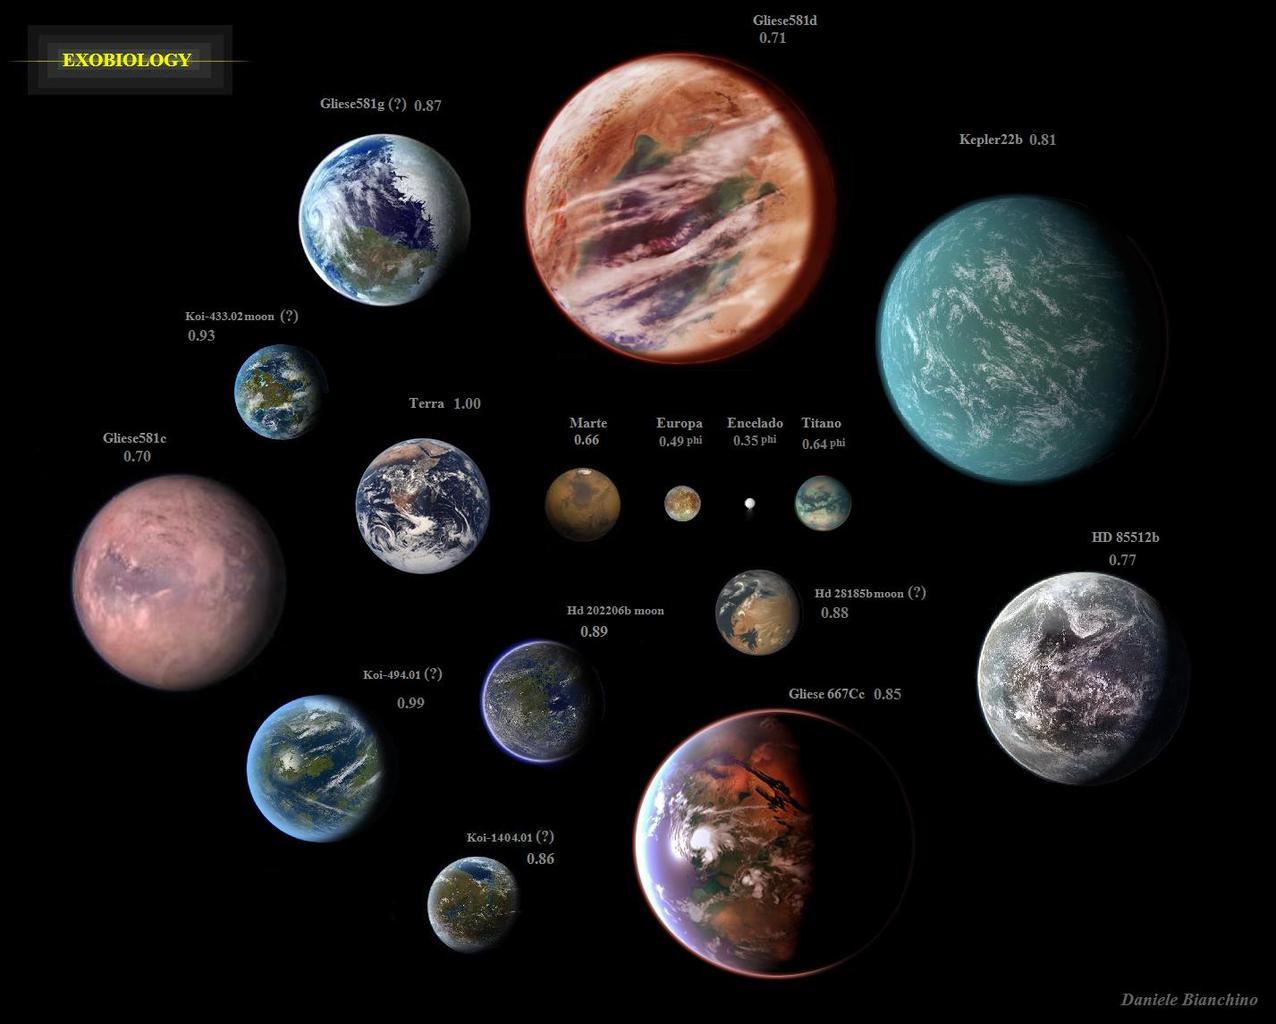 Pianeti extrasolari e forme di vita - Extrasolar visions-planets_pianeti_extrasolari_alieni_gliese581c_gliese581d_kepler22_gliese667cc_gliese581g_hd85512.jpg